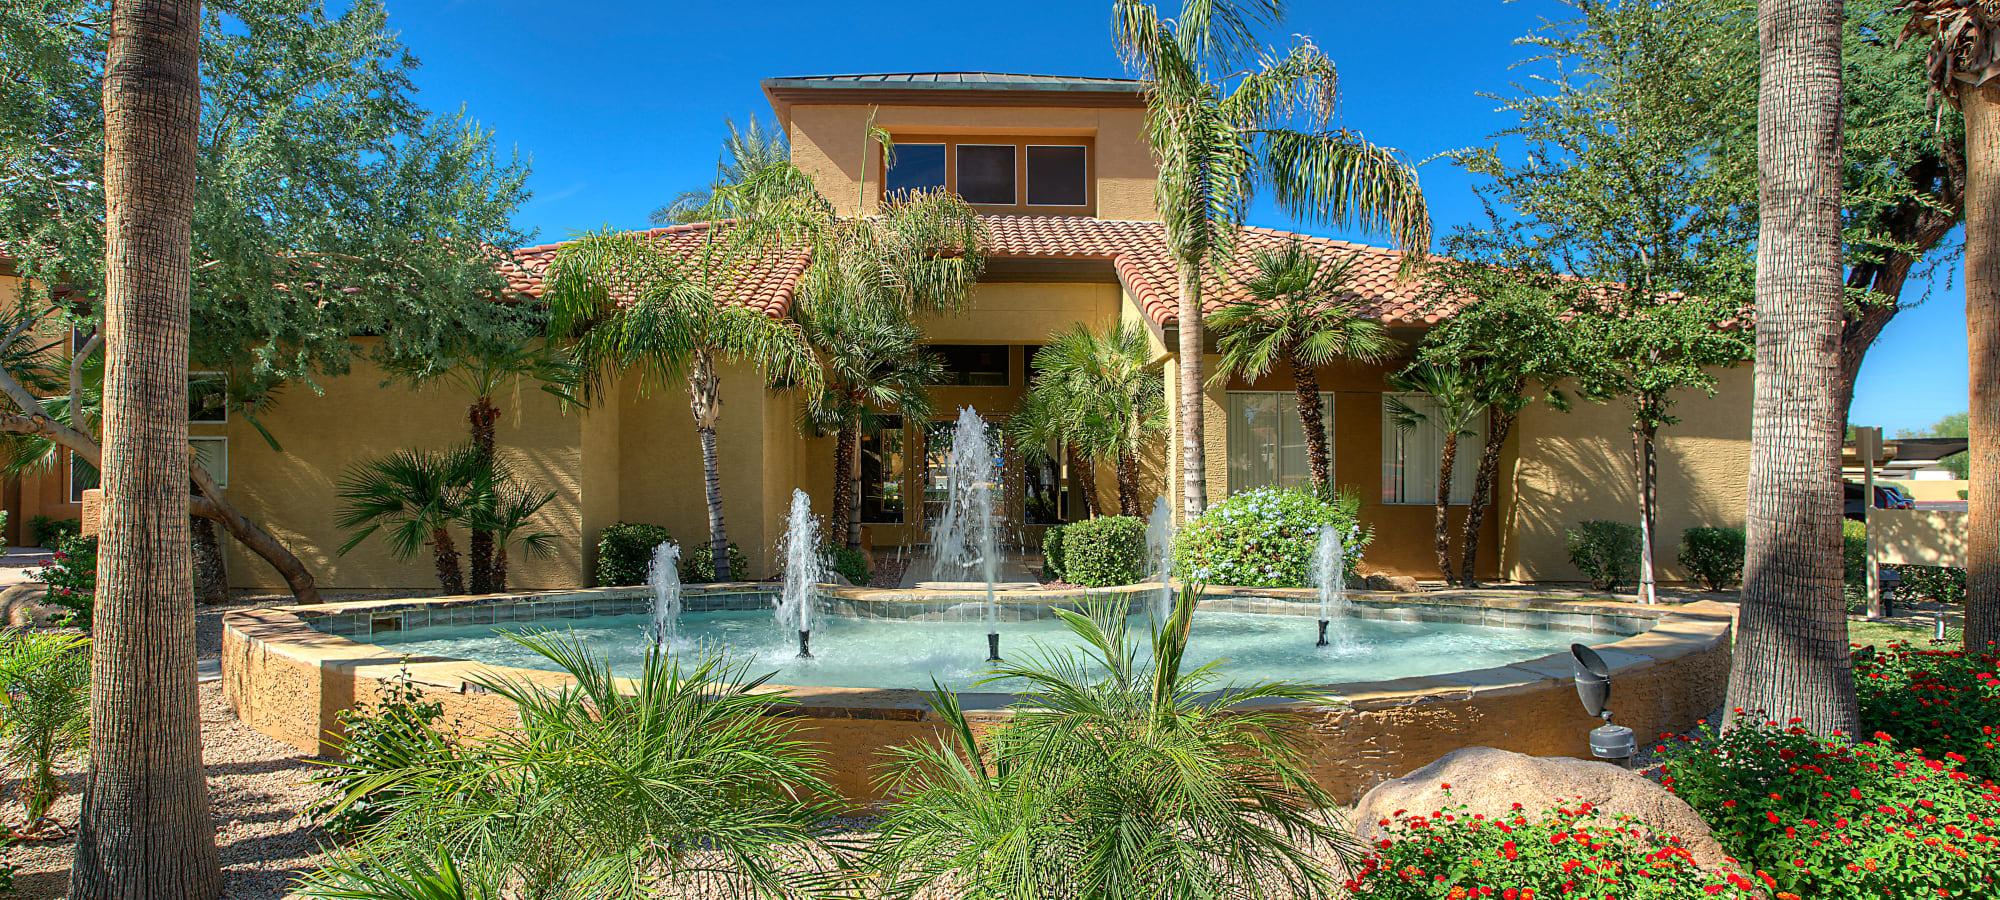 Fountain in the courtyard at Bellagio in Scottsdale, Arizona